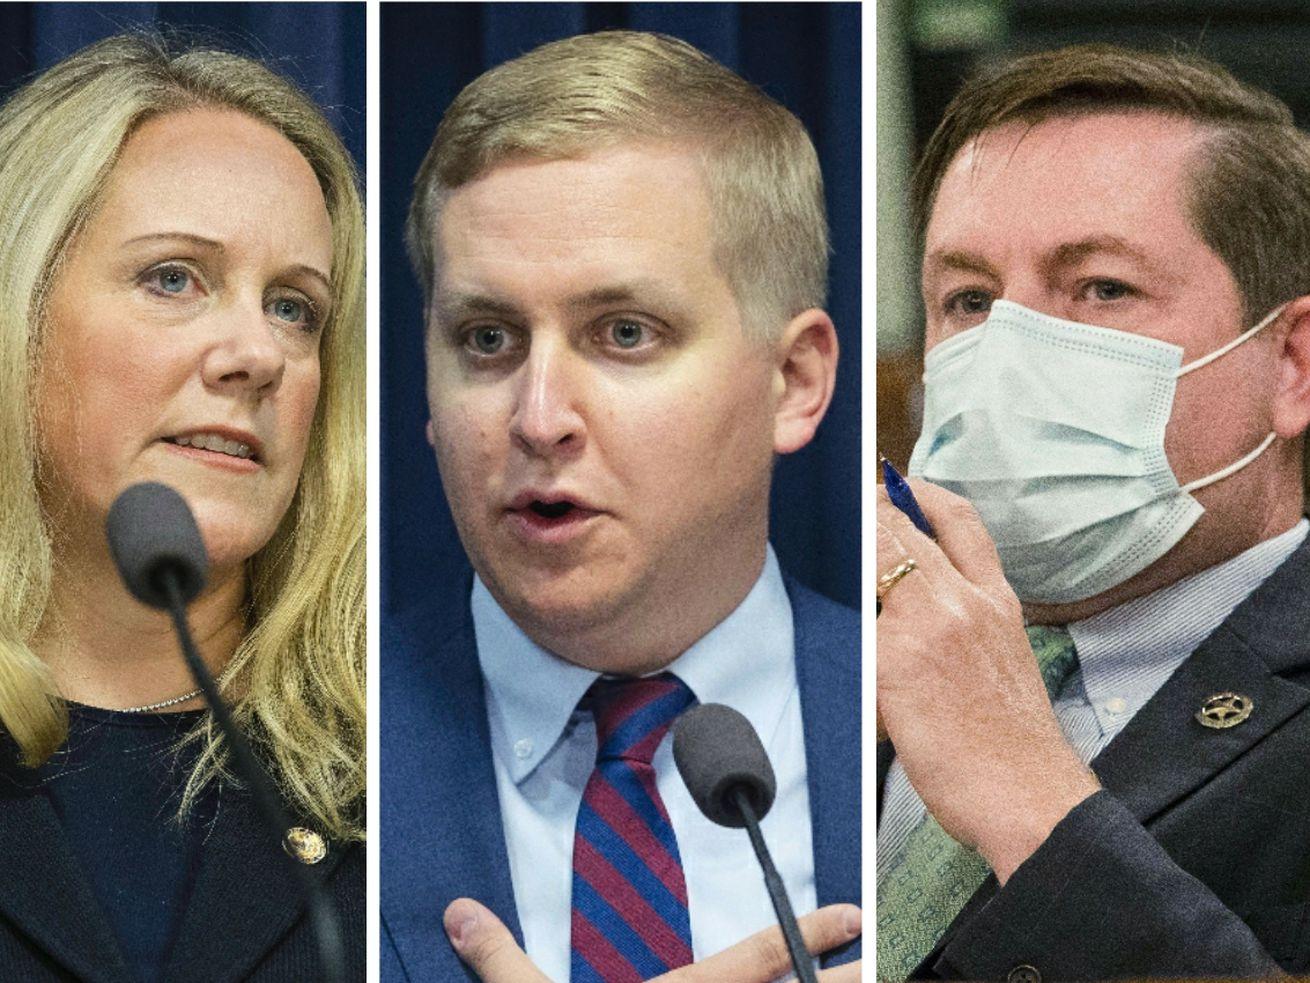 State Rep. Deanne Mazzochi, R-Elmhurst, left; state Rep. Tom Demmer, R-Dixon, center; state Rep. Grant Wehrli, R-Naperville, right.